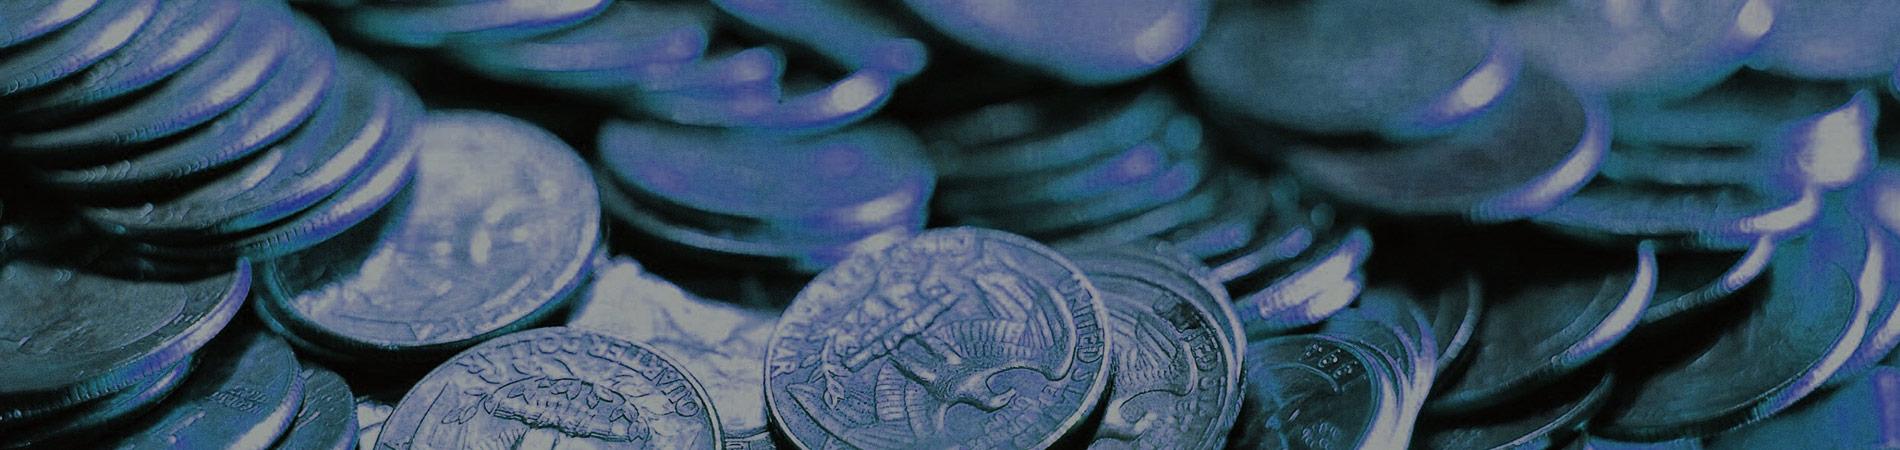 coins_money-wide